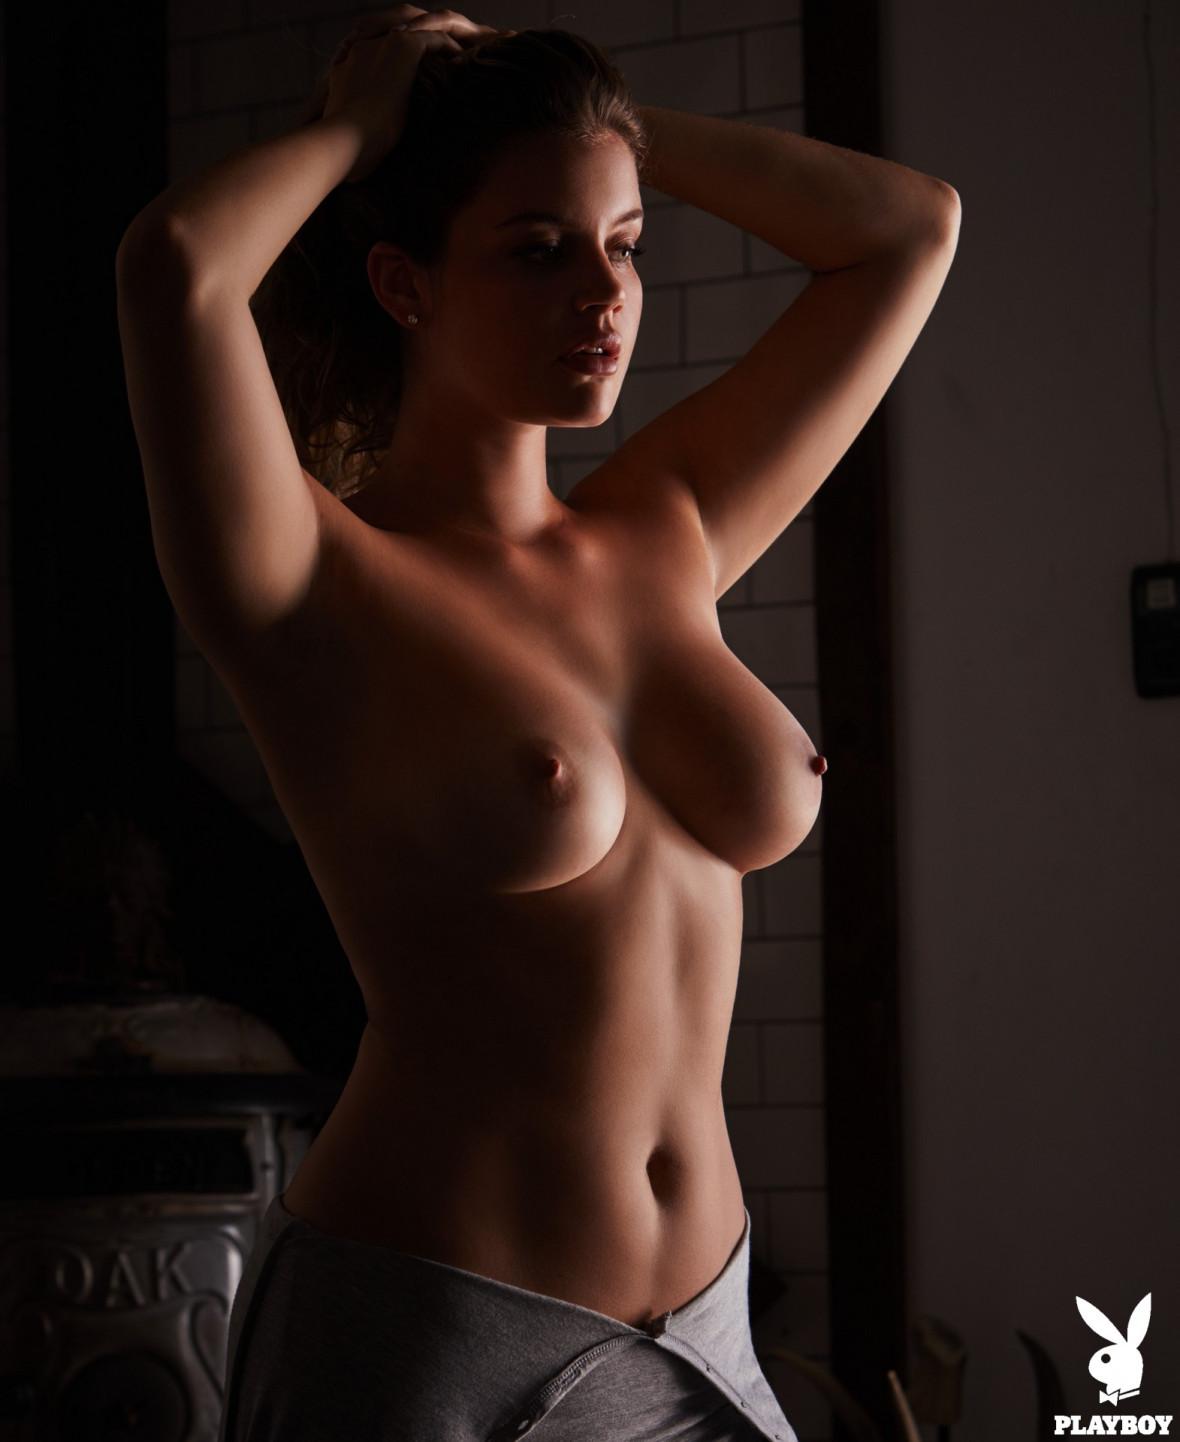 Shelby Rose - Kyle Deleu (Playboy) photoshoot